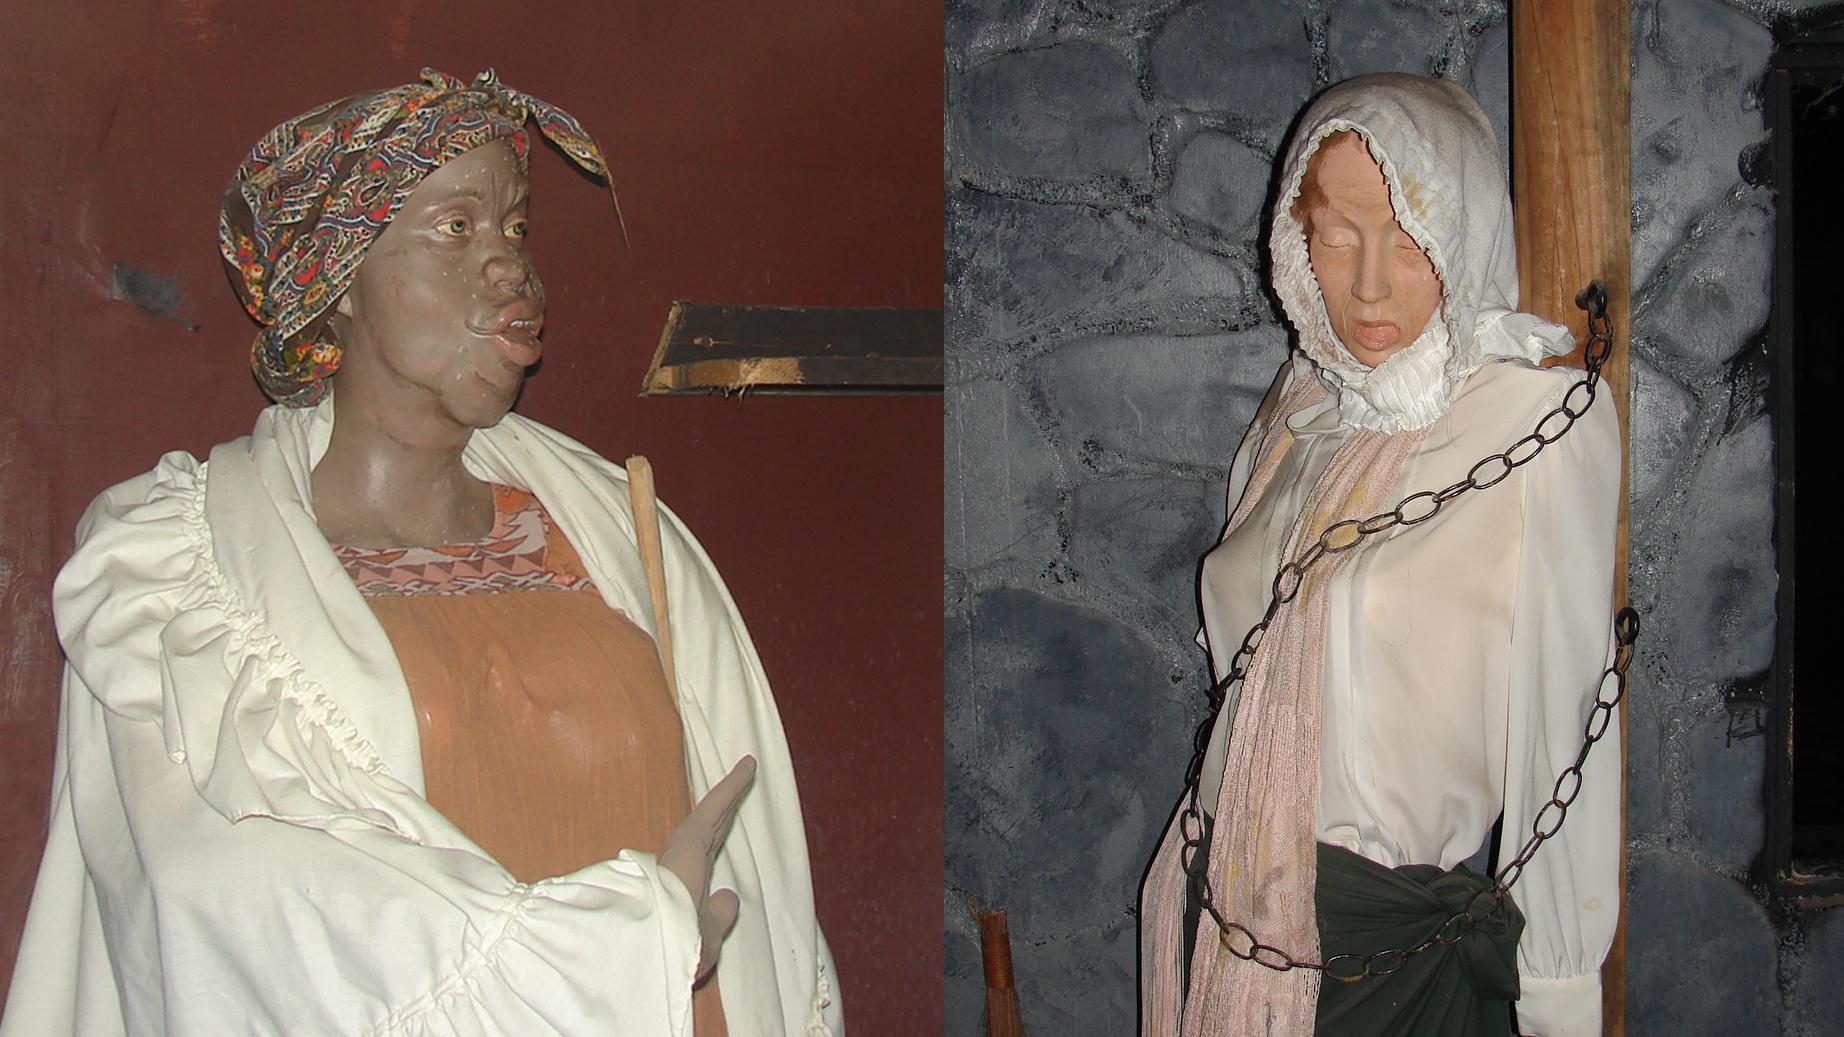 Racist Dioramas